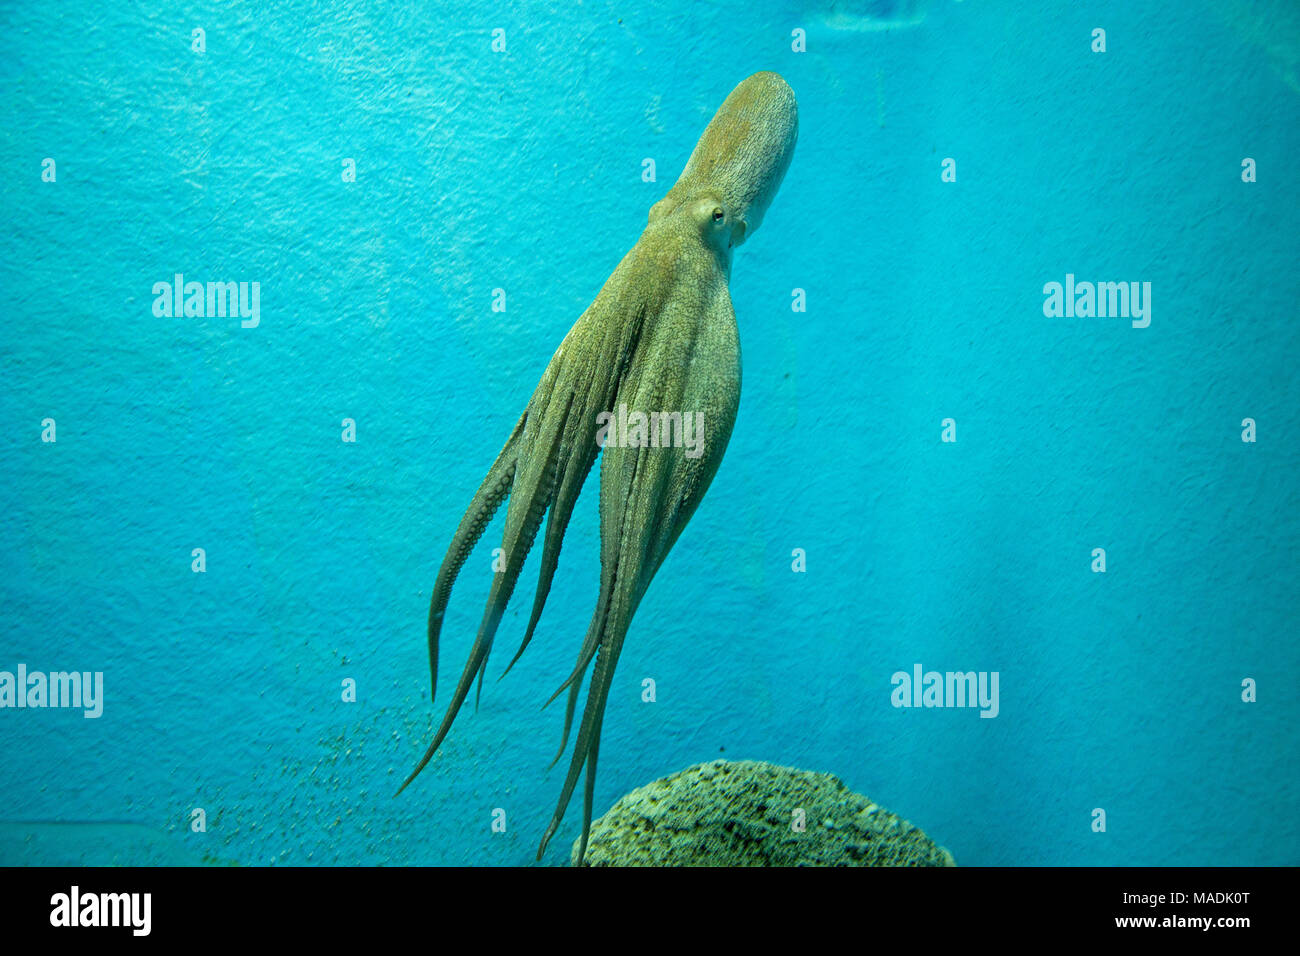 octopus at the aquarium, old town, Dubrovnik, Croatia - Stock Image